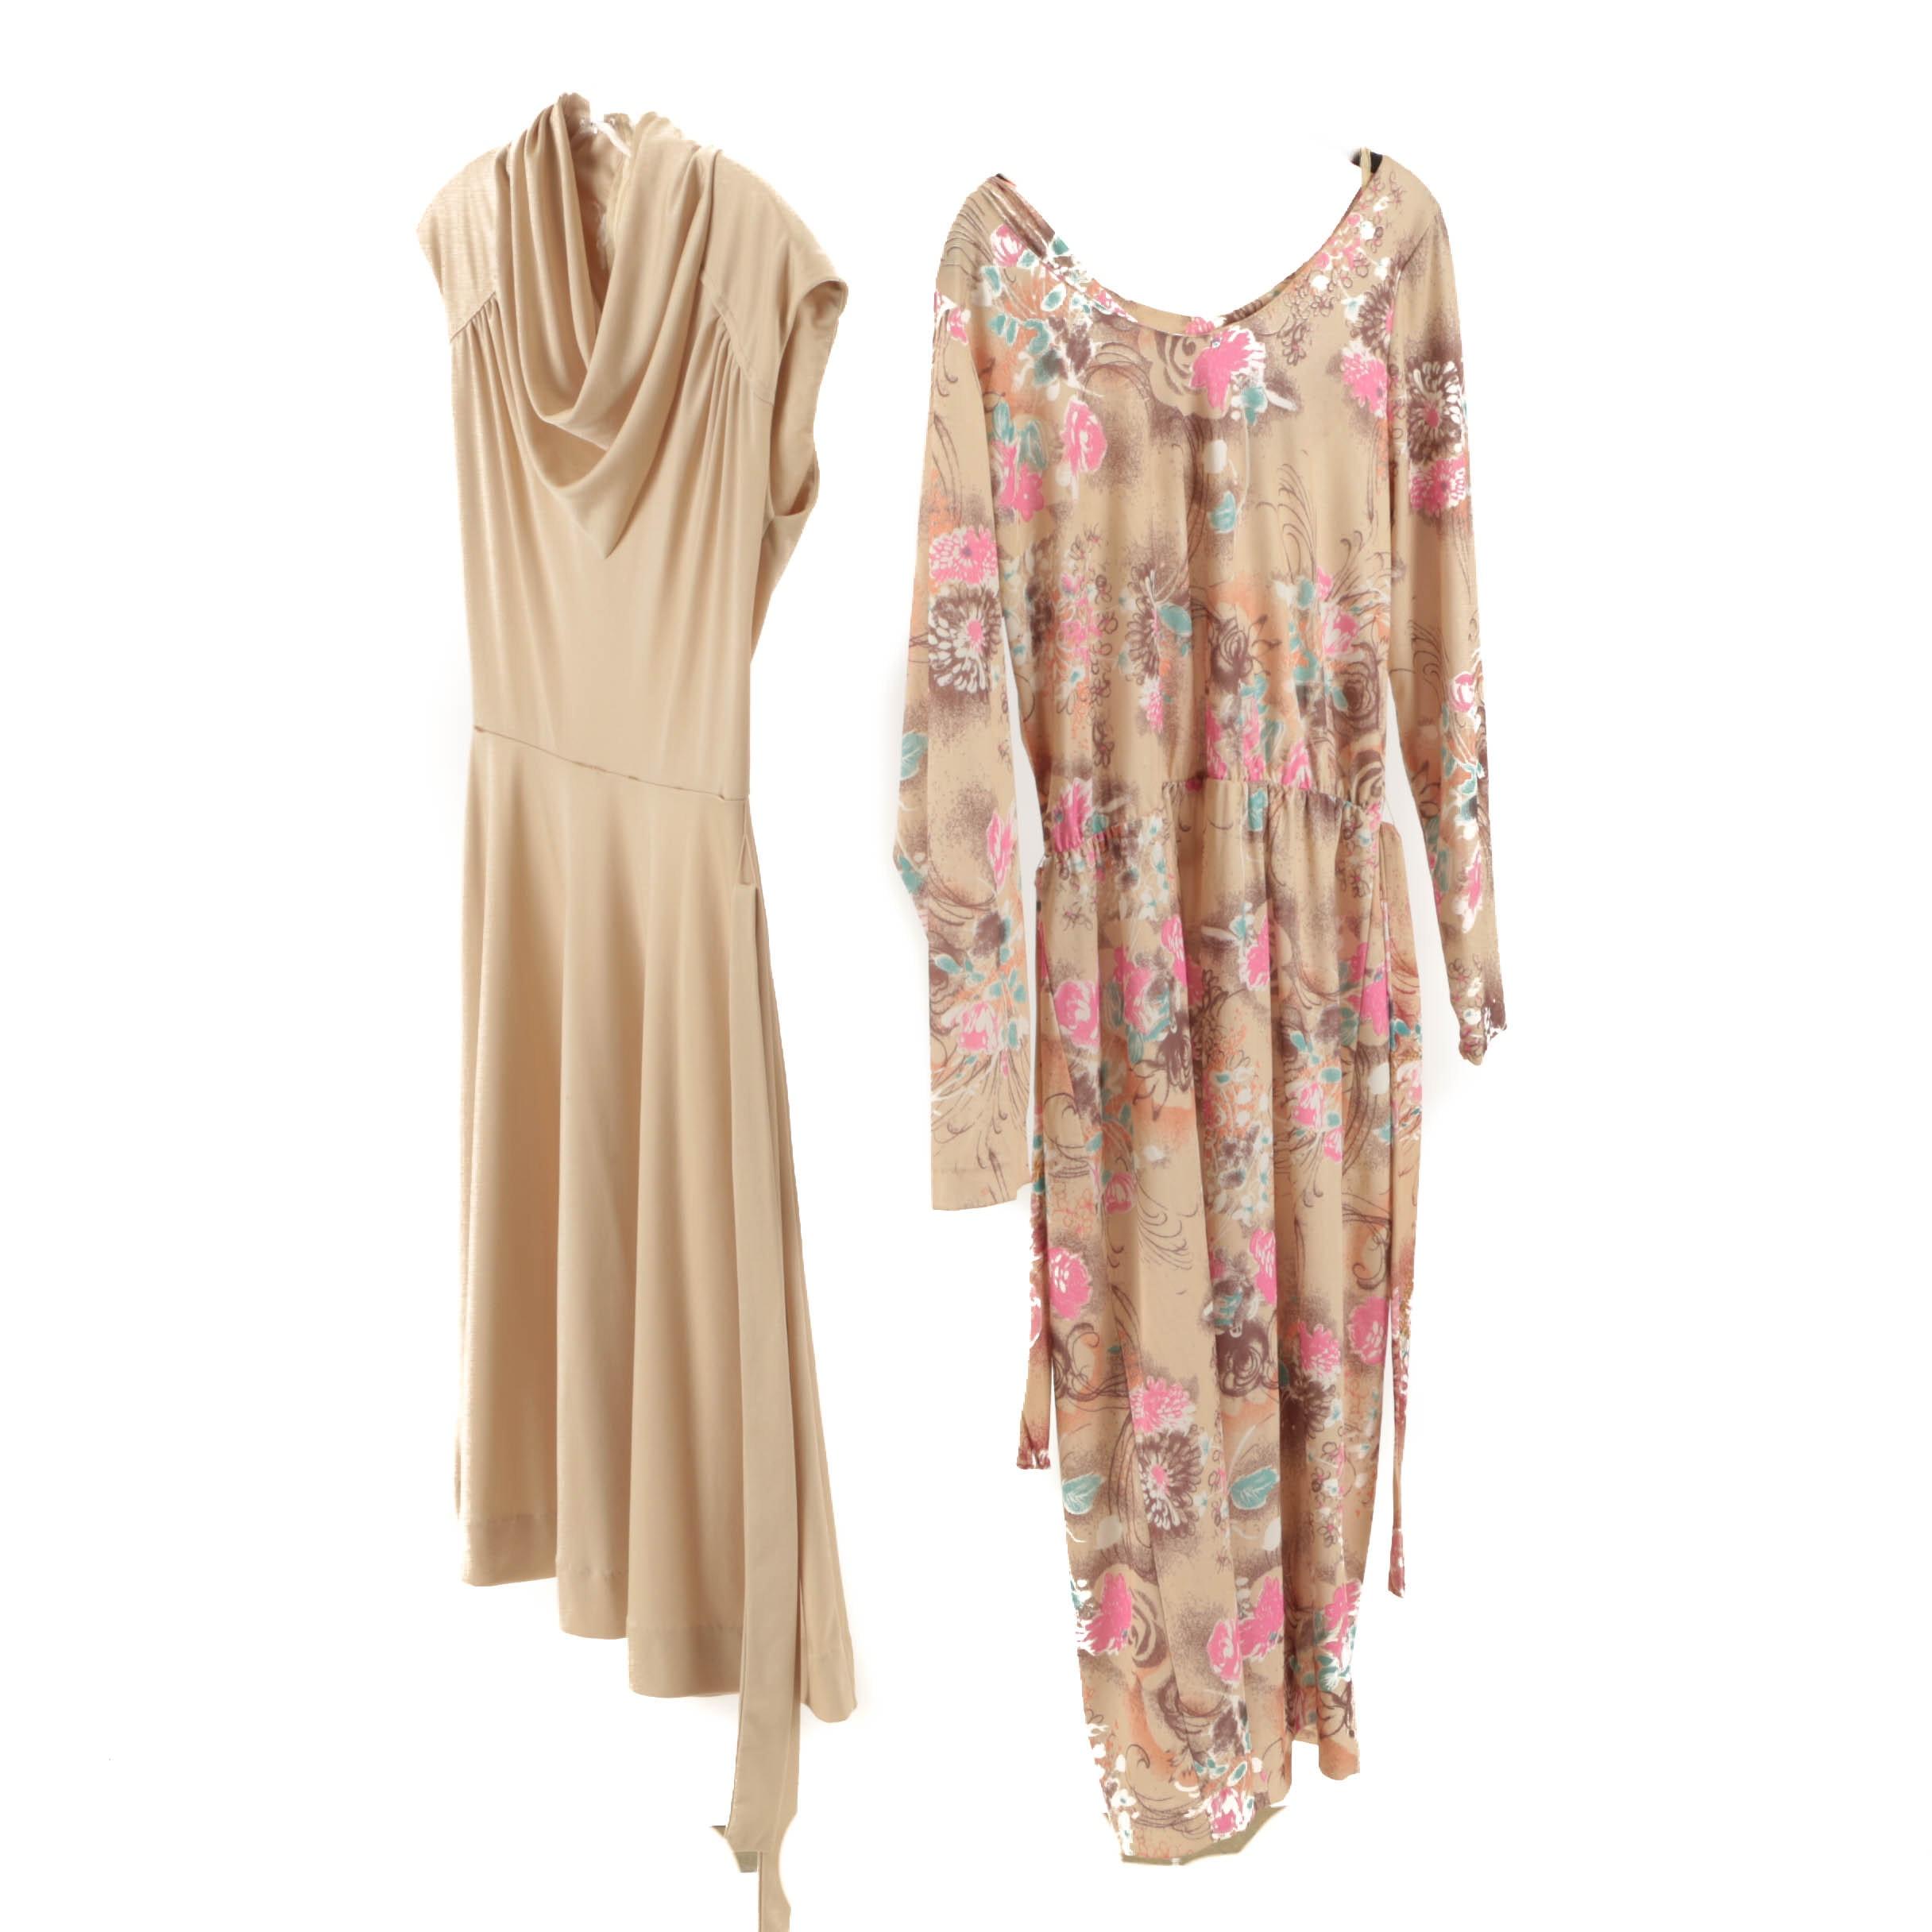 1970s Vintage Dresses